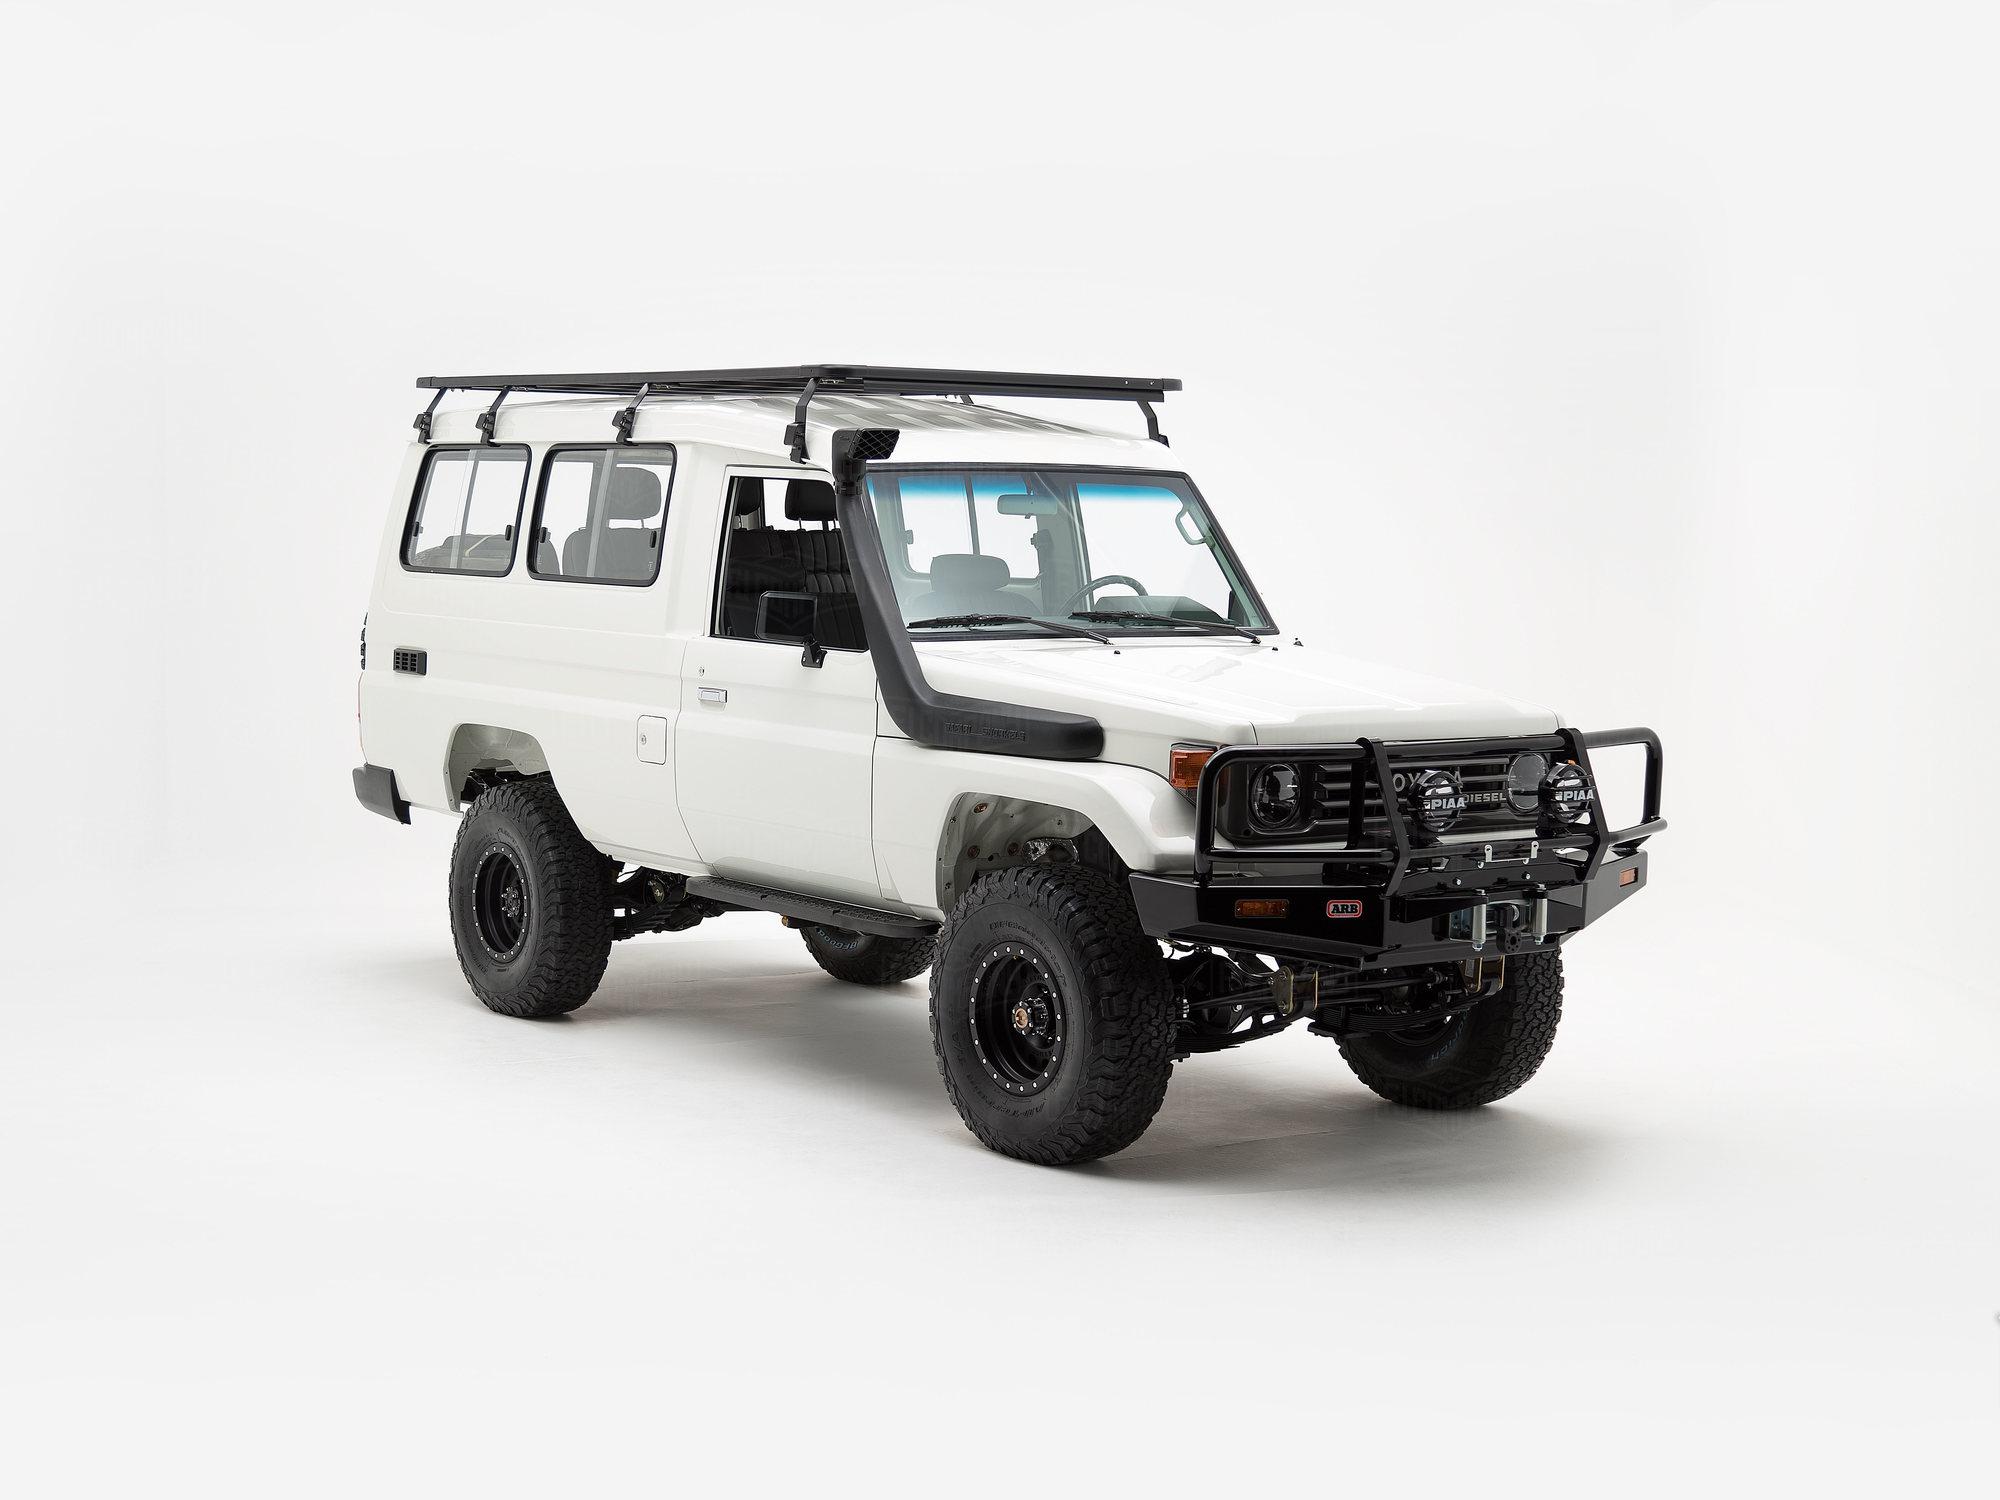 Toyota Dealer Miami >> 1992 HZJ75 - White - HZJ75-0008063